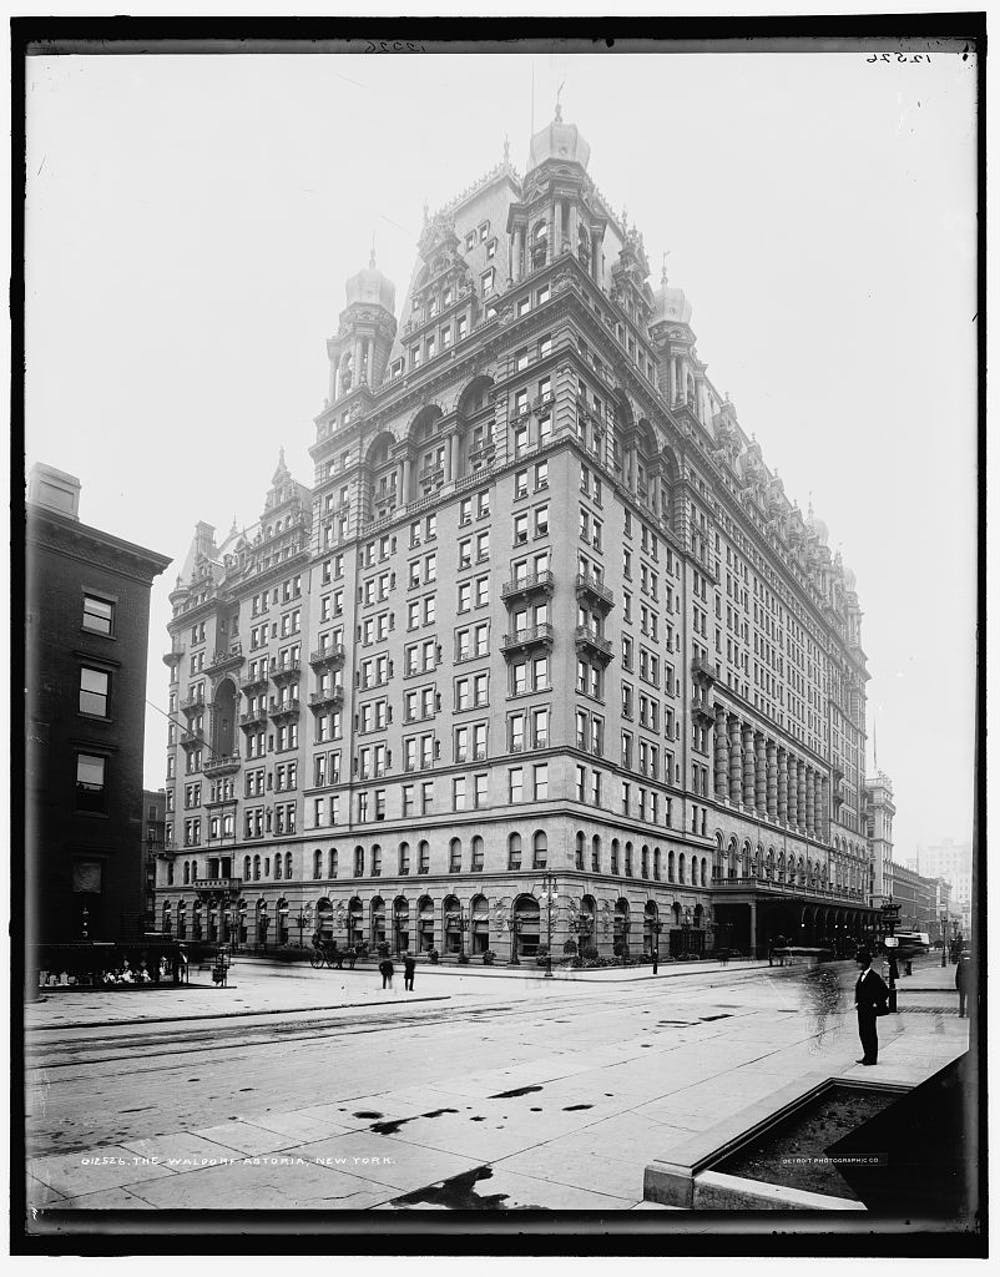 Remembering America's lost buildings